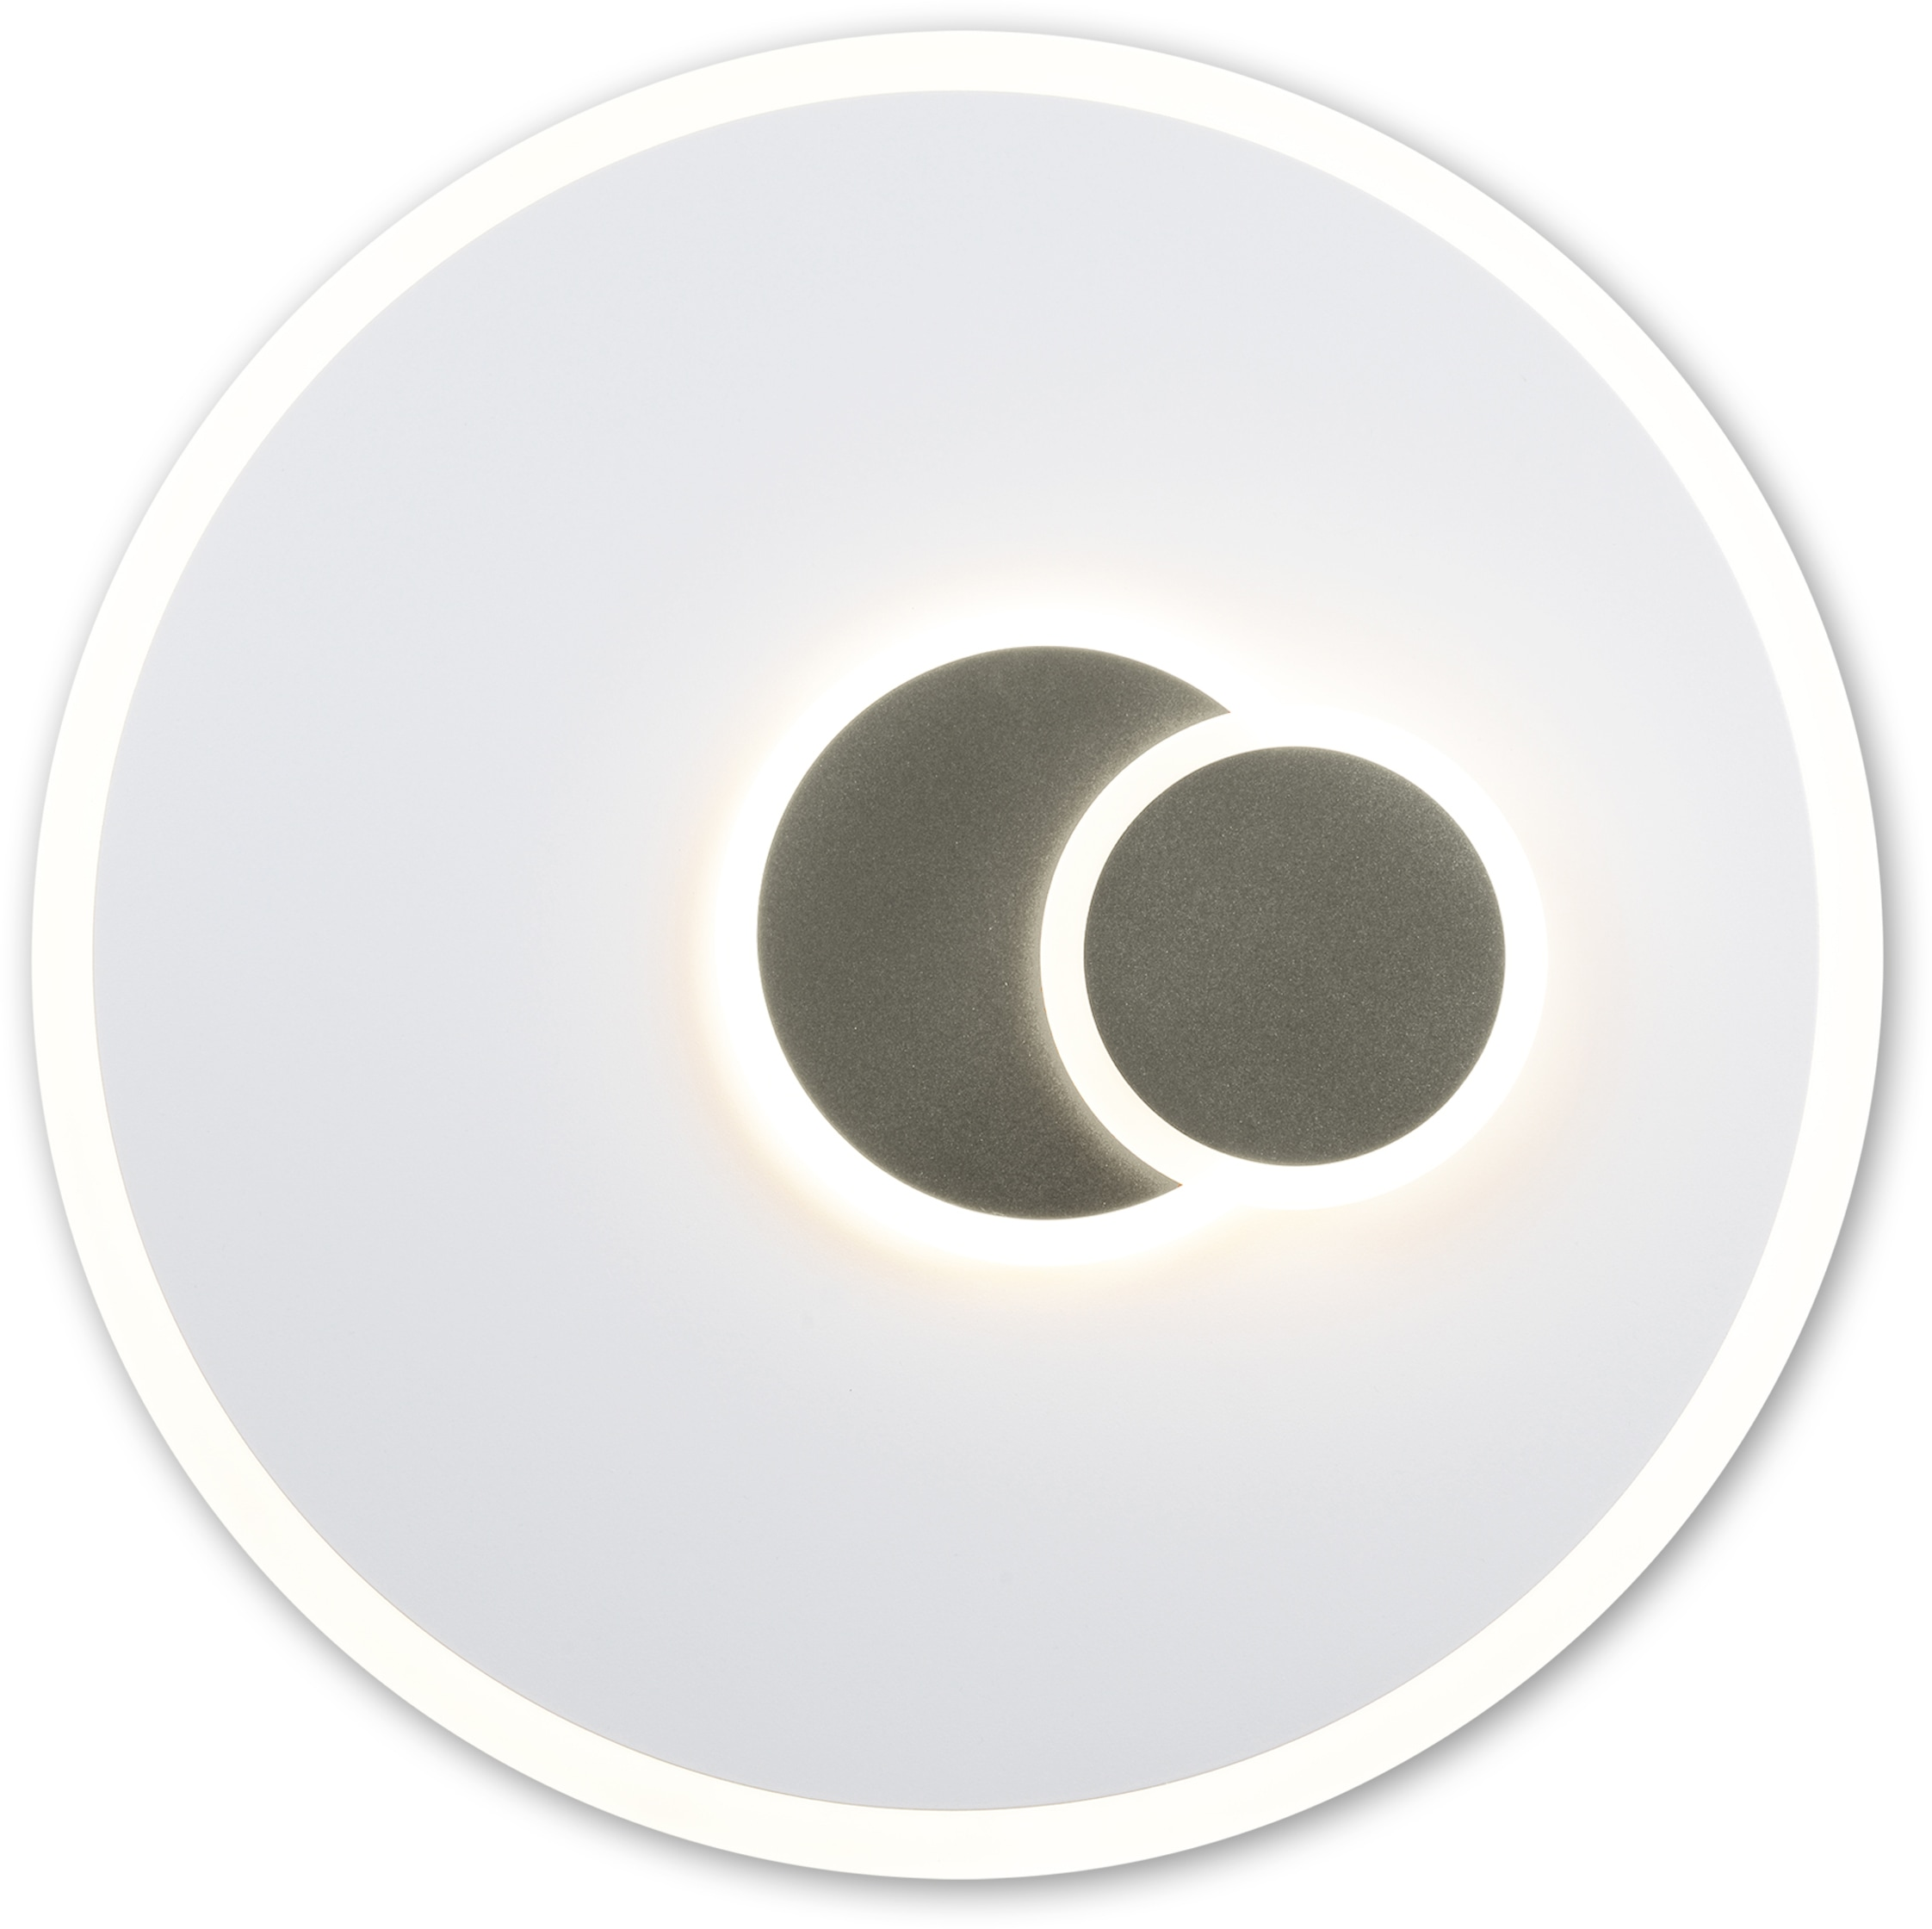 näve LED Deckenleuchte Aarhus, LED-Board, 1 St., Warmweiß, dimmbar